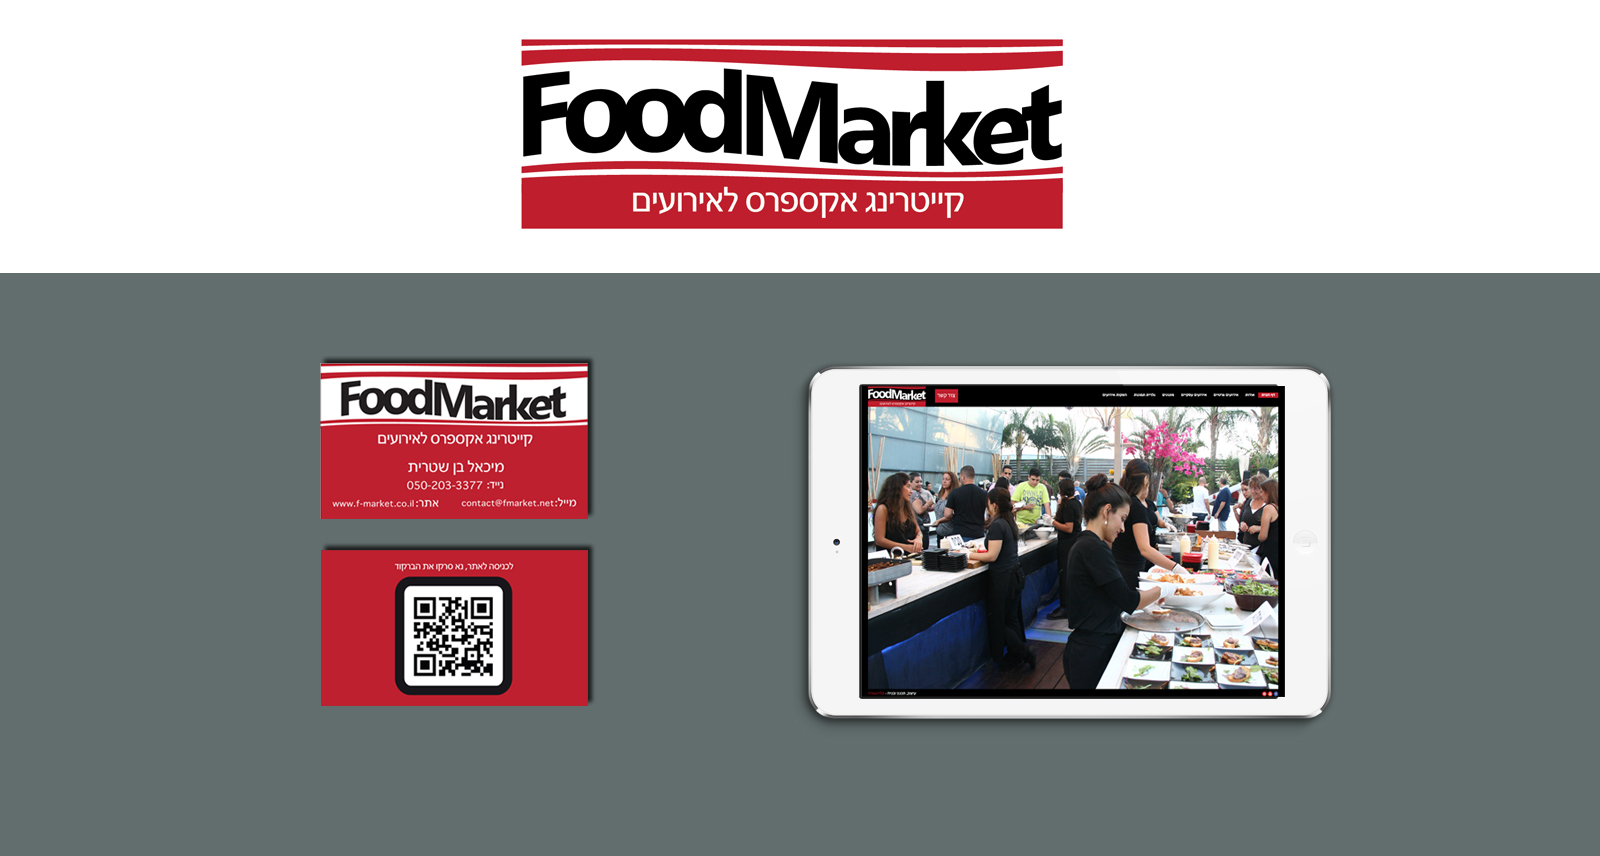 Branding-Identity-Mock-Up_foodmarket